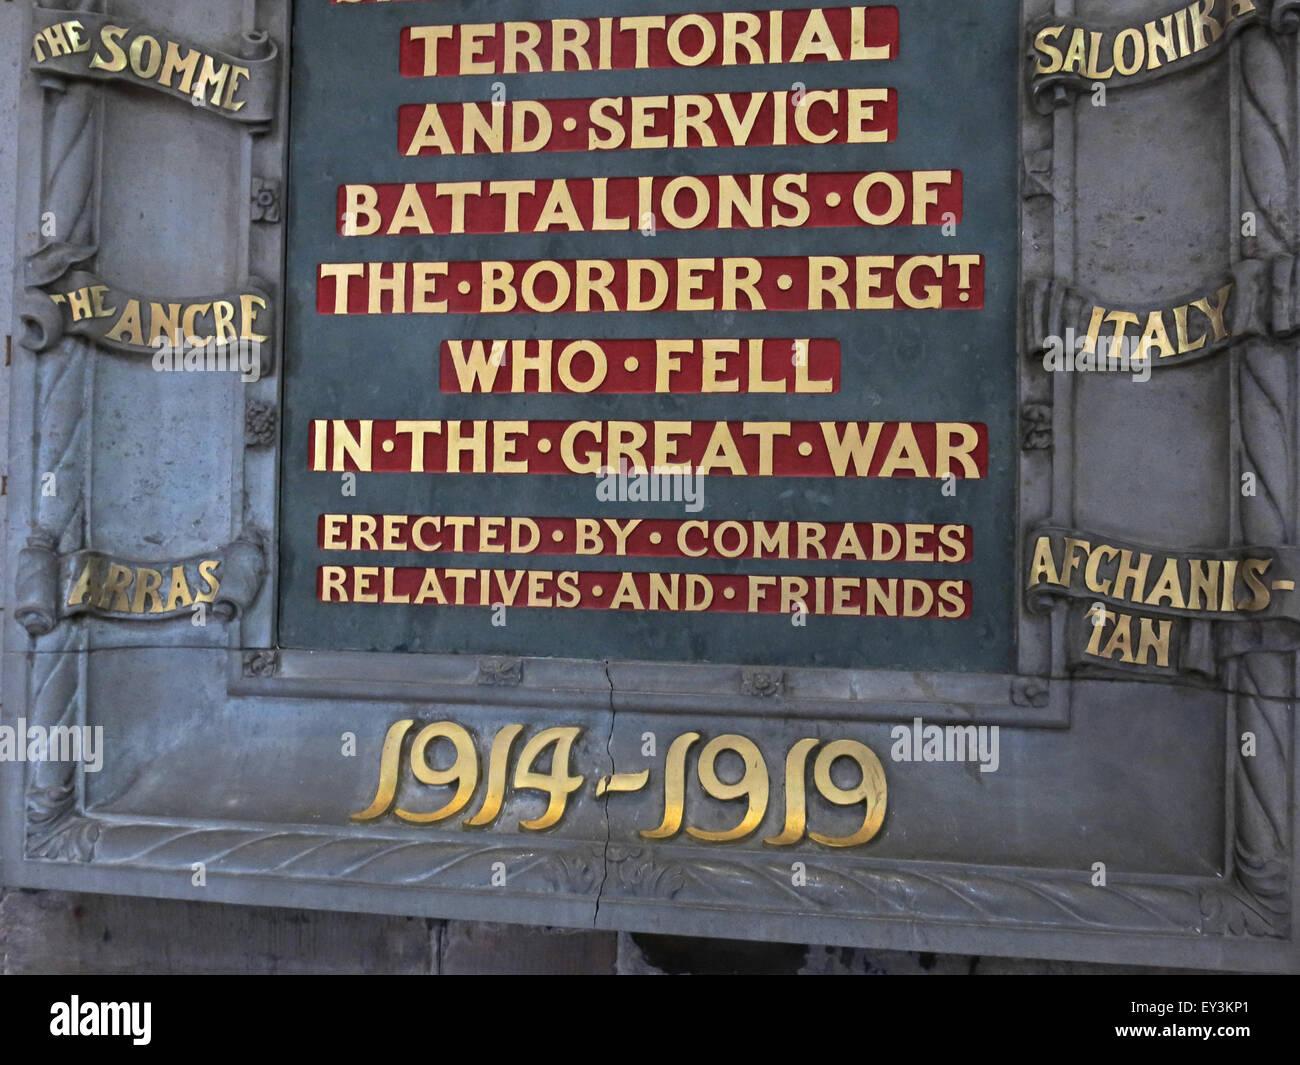 Laden Sie dieses Alamy Stockfoto Stein-Denkmal in Carlisle Kathedrale, 1914-1919, Cumbria, England, UK - EY3KP1